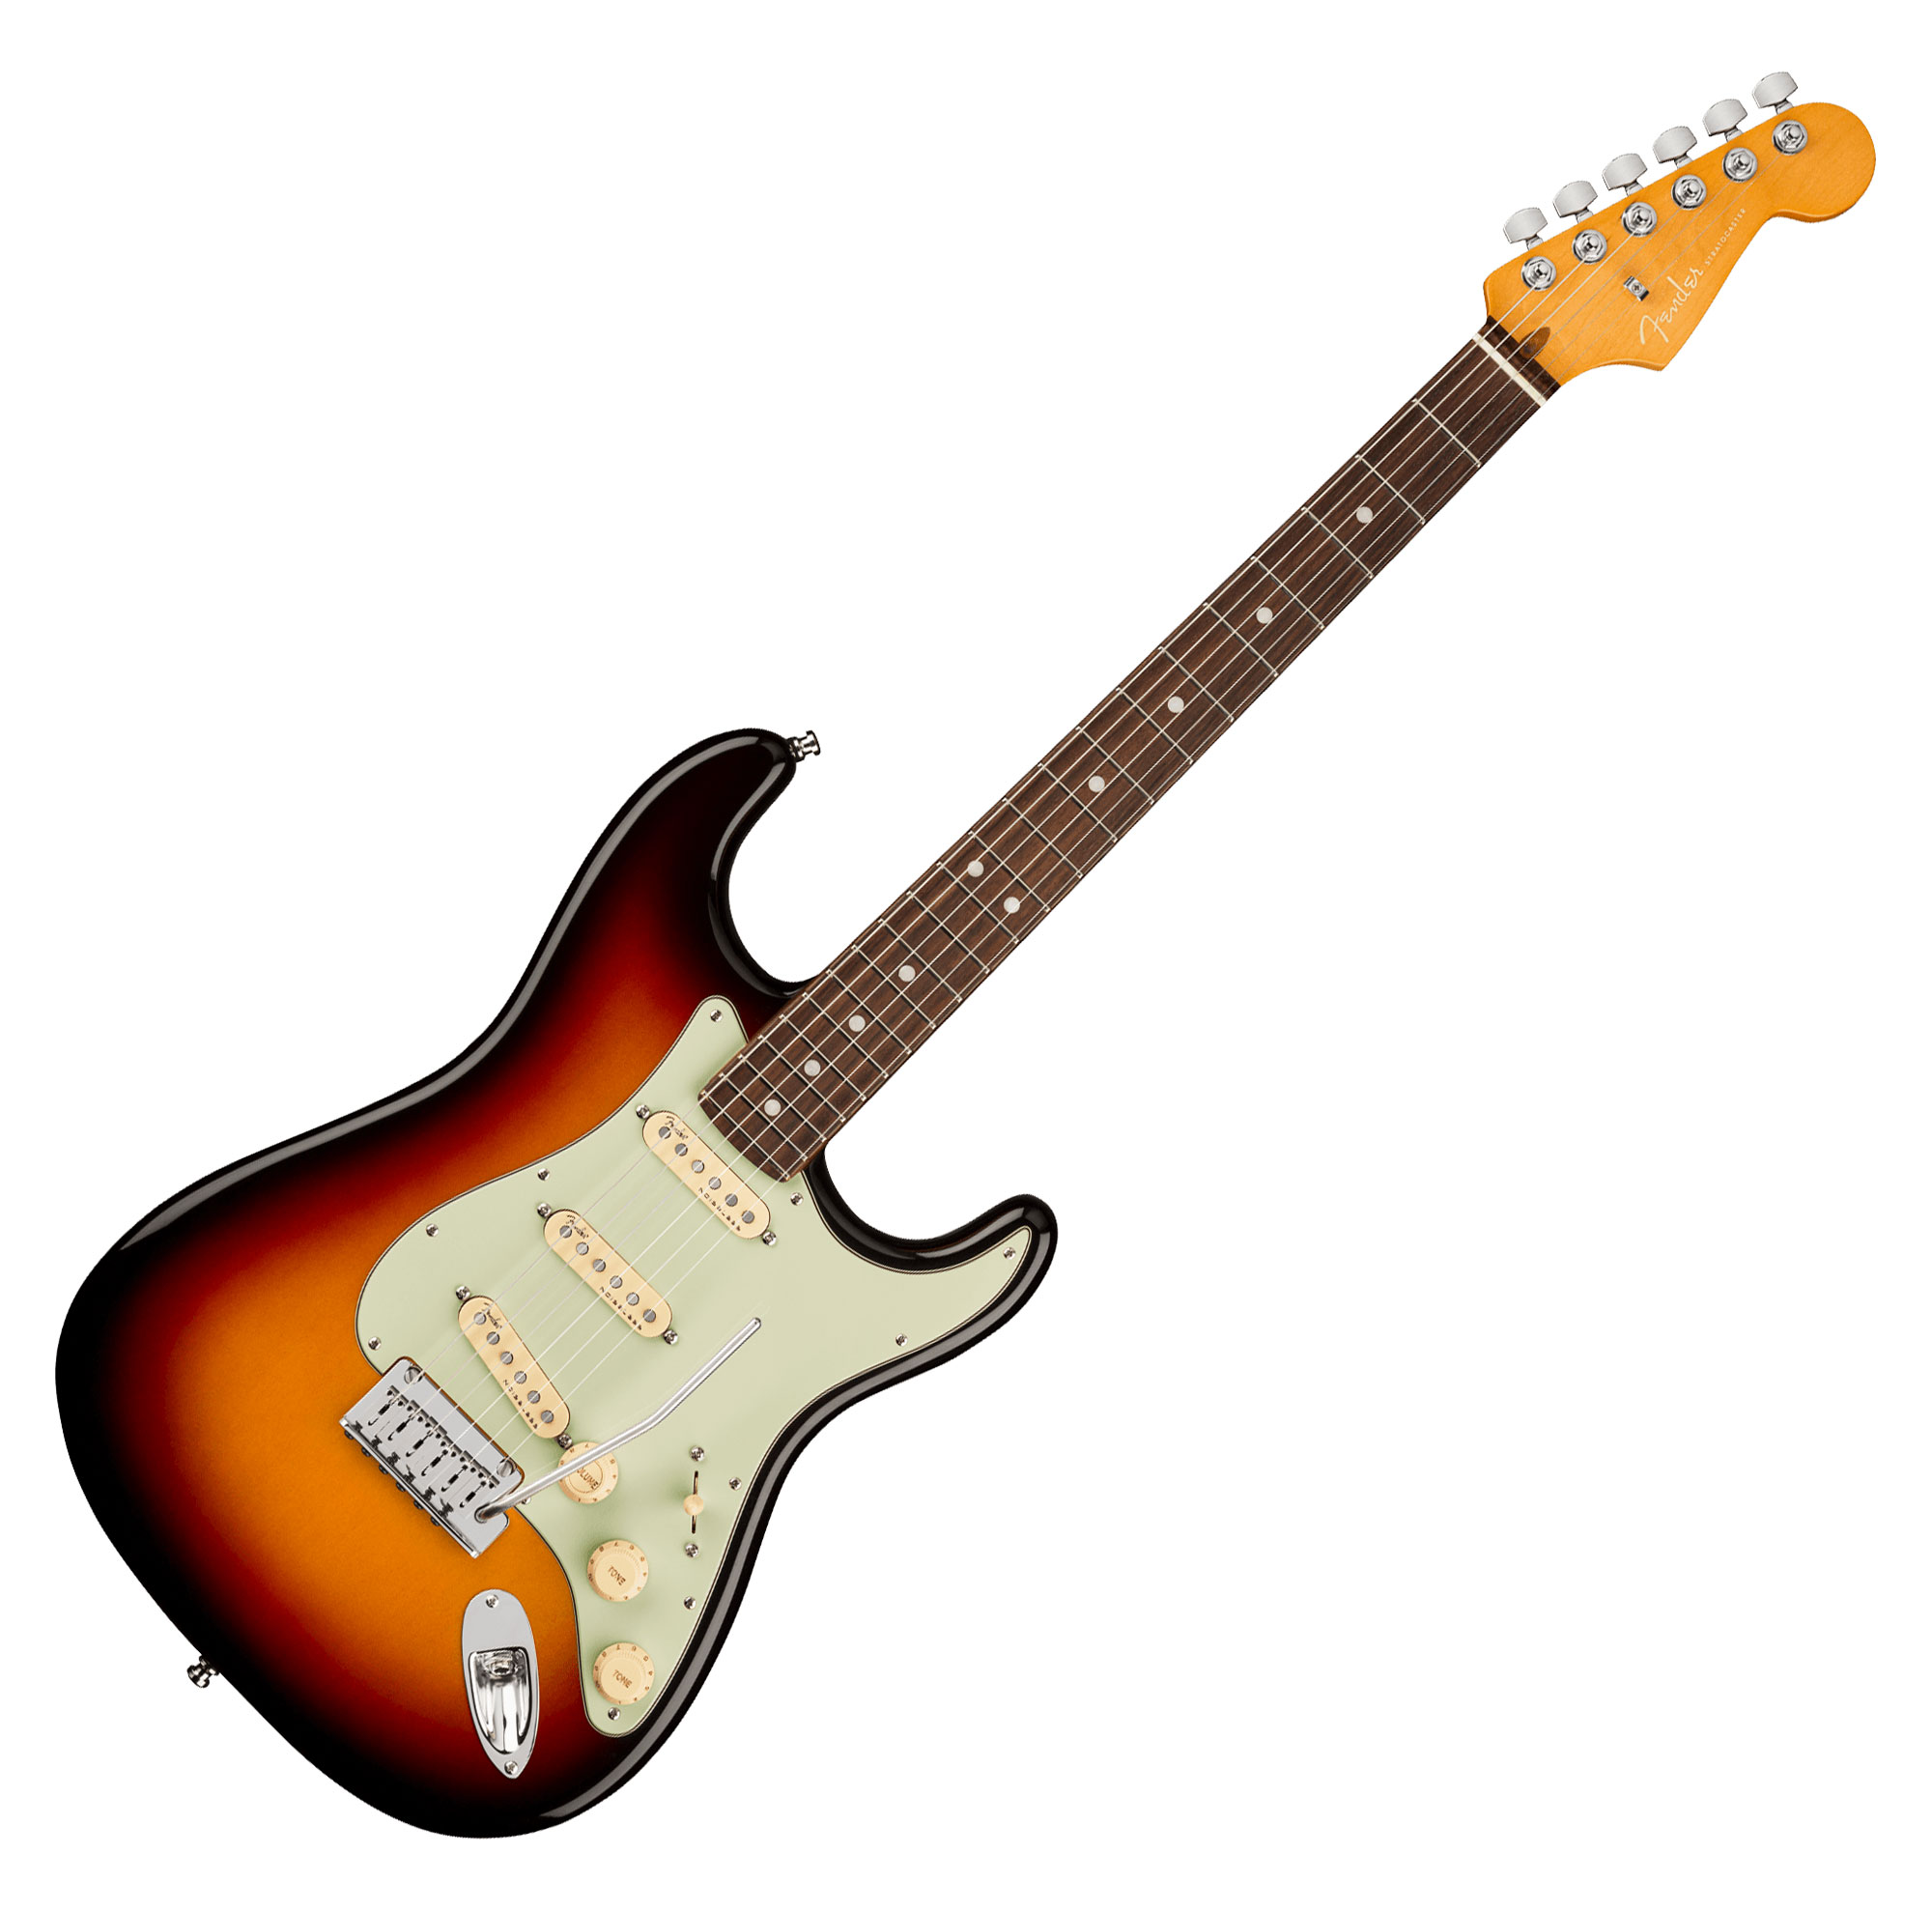 Egitarren - Fender American Ultra Stratocaster RW Ultraburst - Onlineshop Musikhaus Kirstein